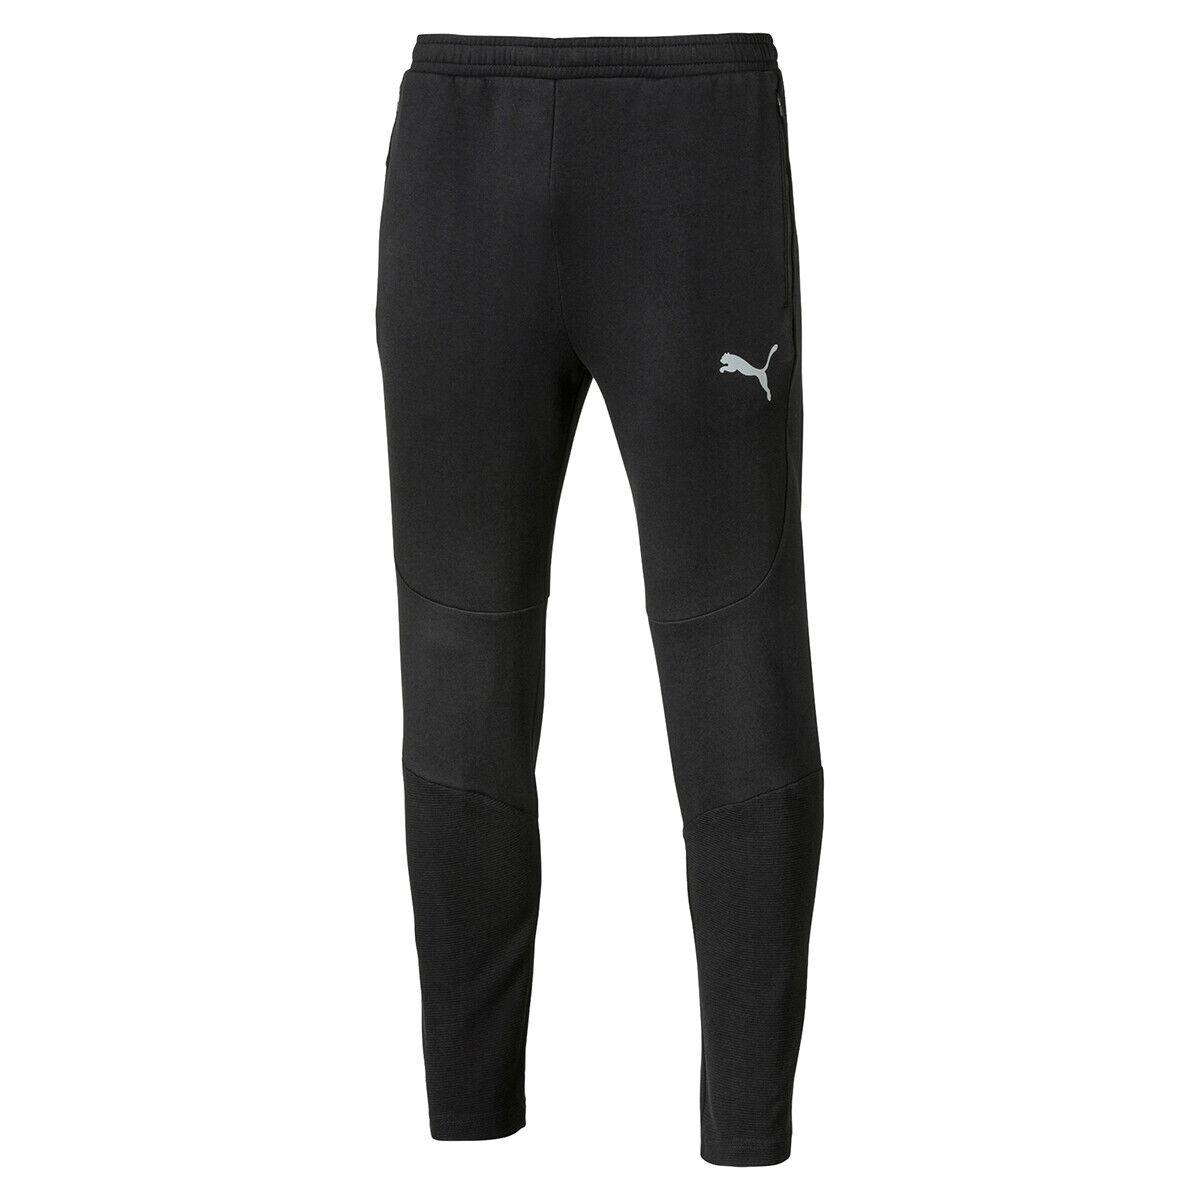 PUMA Evostripe Pants  Herren Sporthose Trainings Hose Sweatpants 580103 schwarz